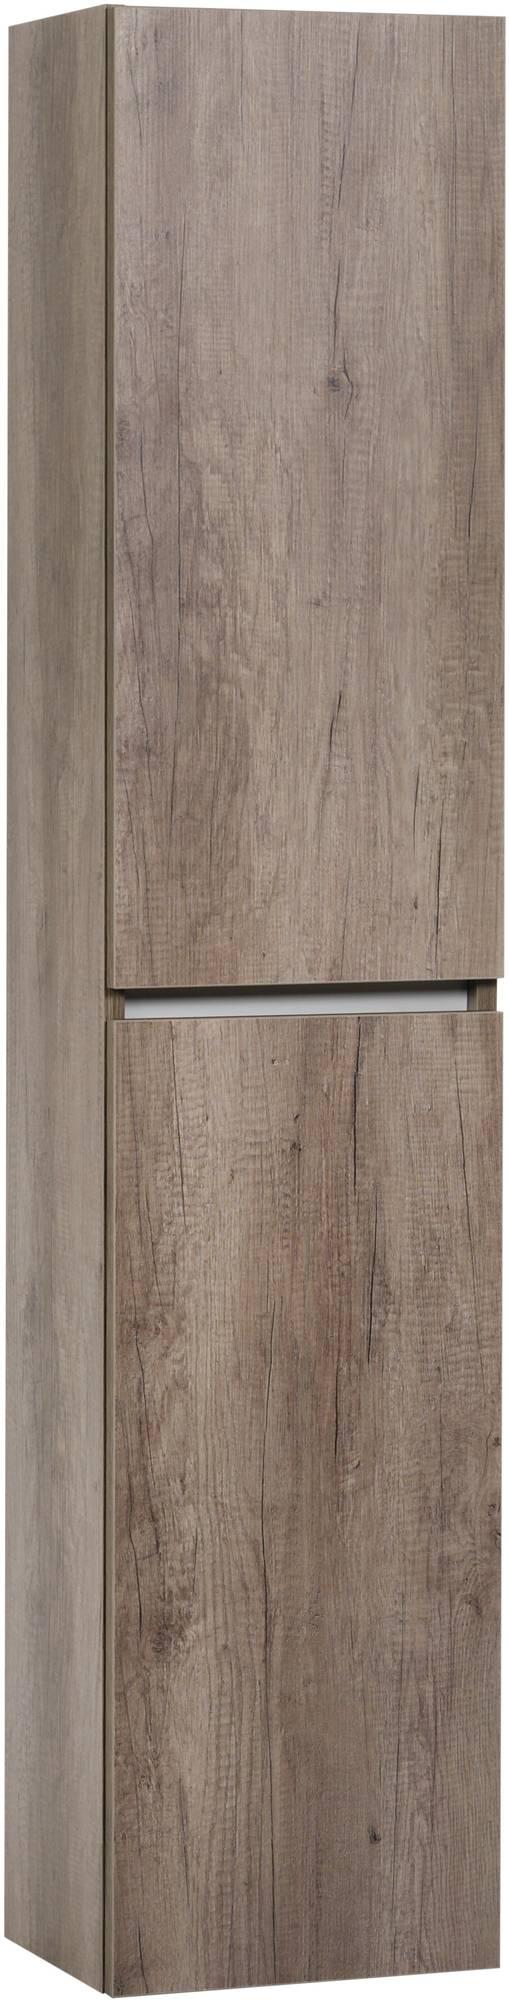 Ben Limara Hoge kast rechts 35x29x165 cm Nebraska Eiken/Aluminium